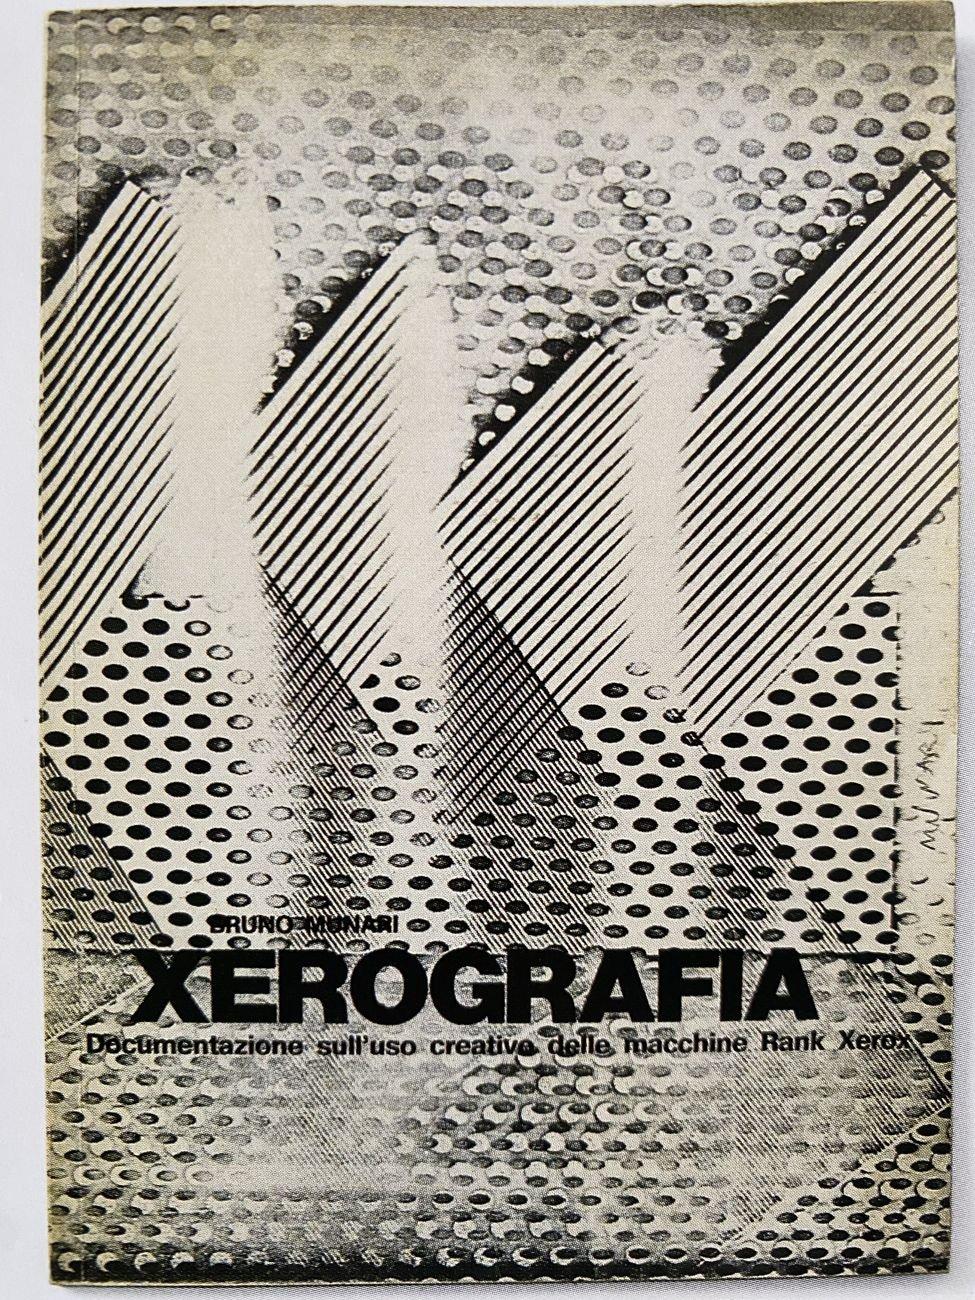 Bruno Munari, Xerografia, 1972